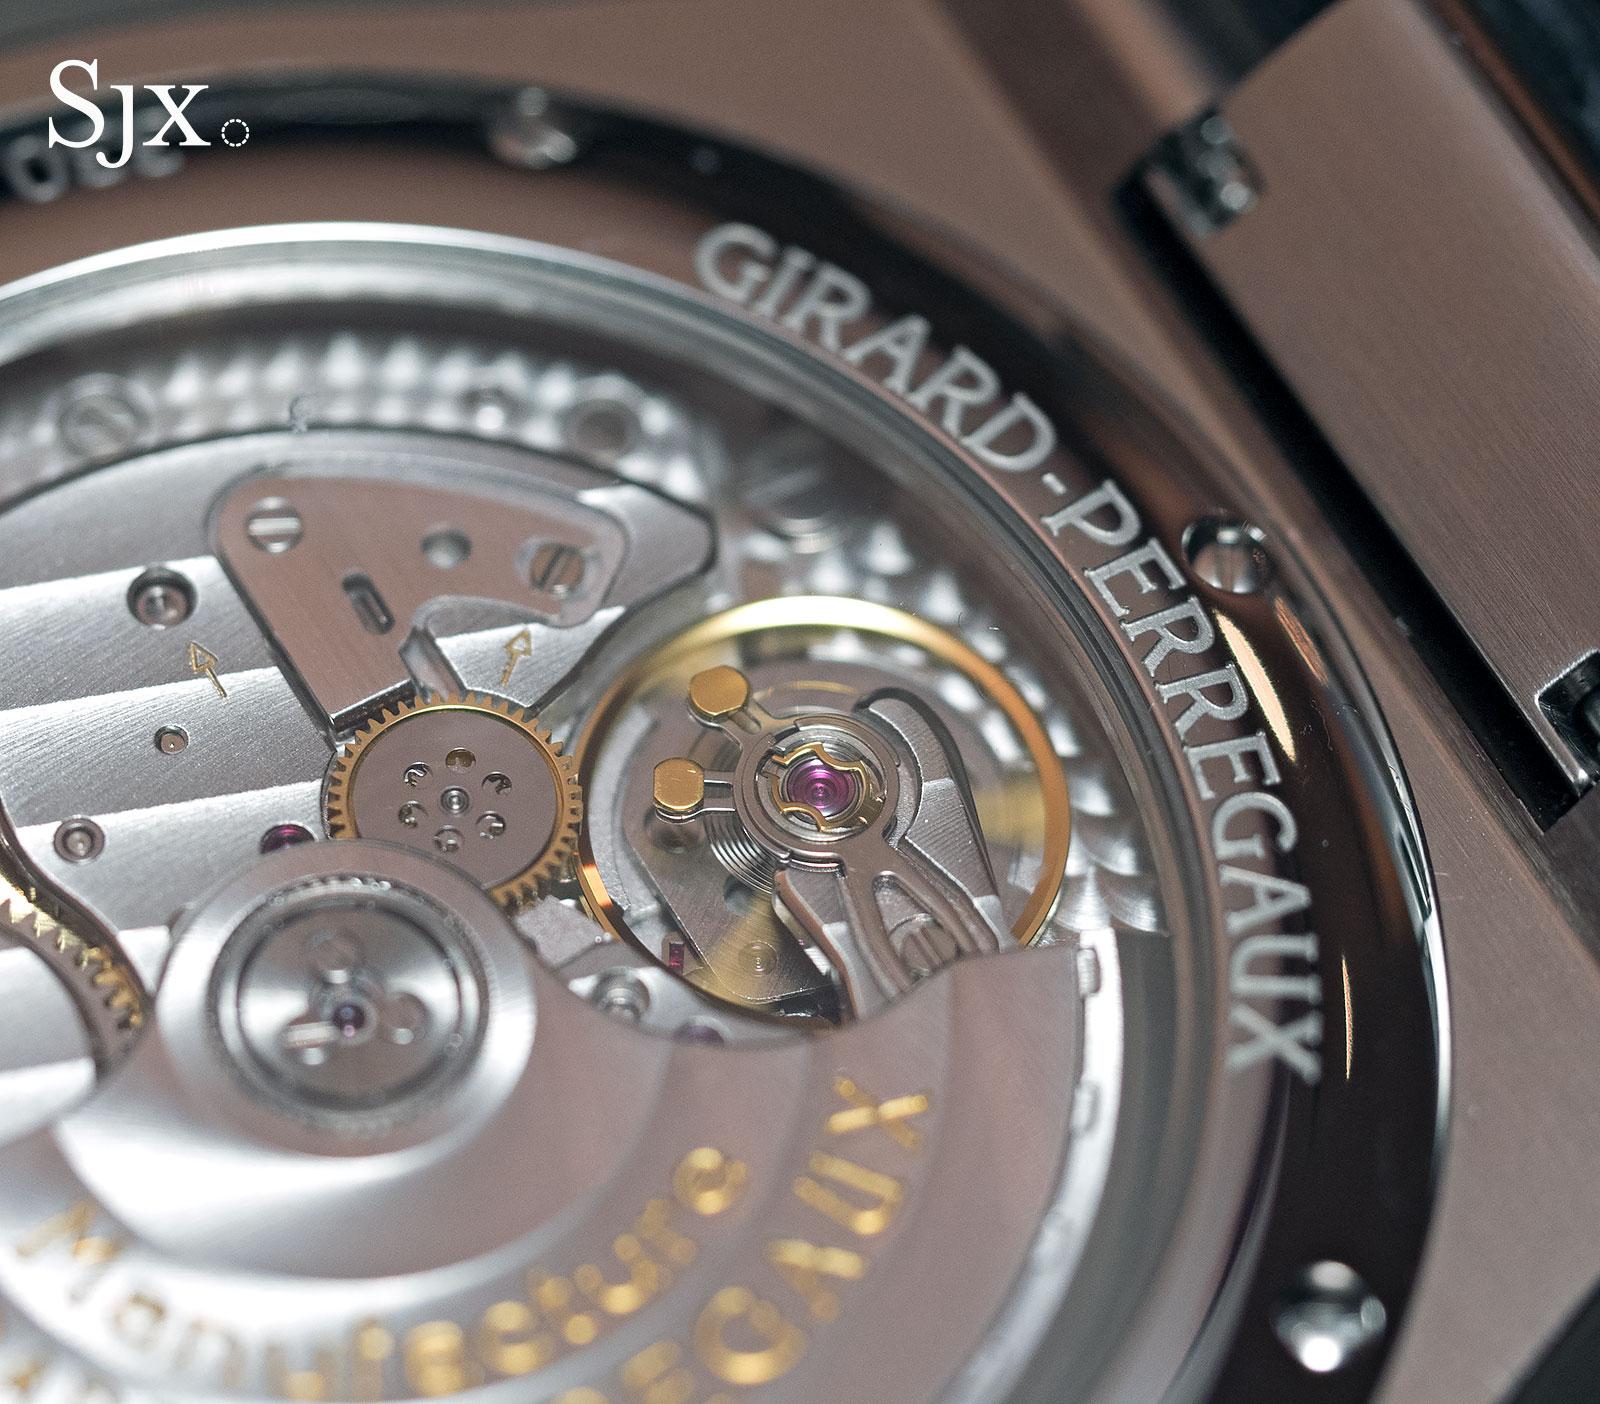 Girard-Perregaux Laureato 42mm 9